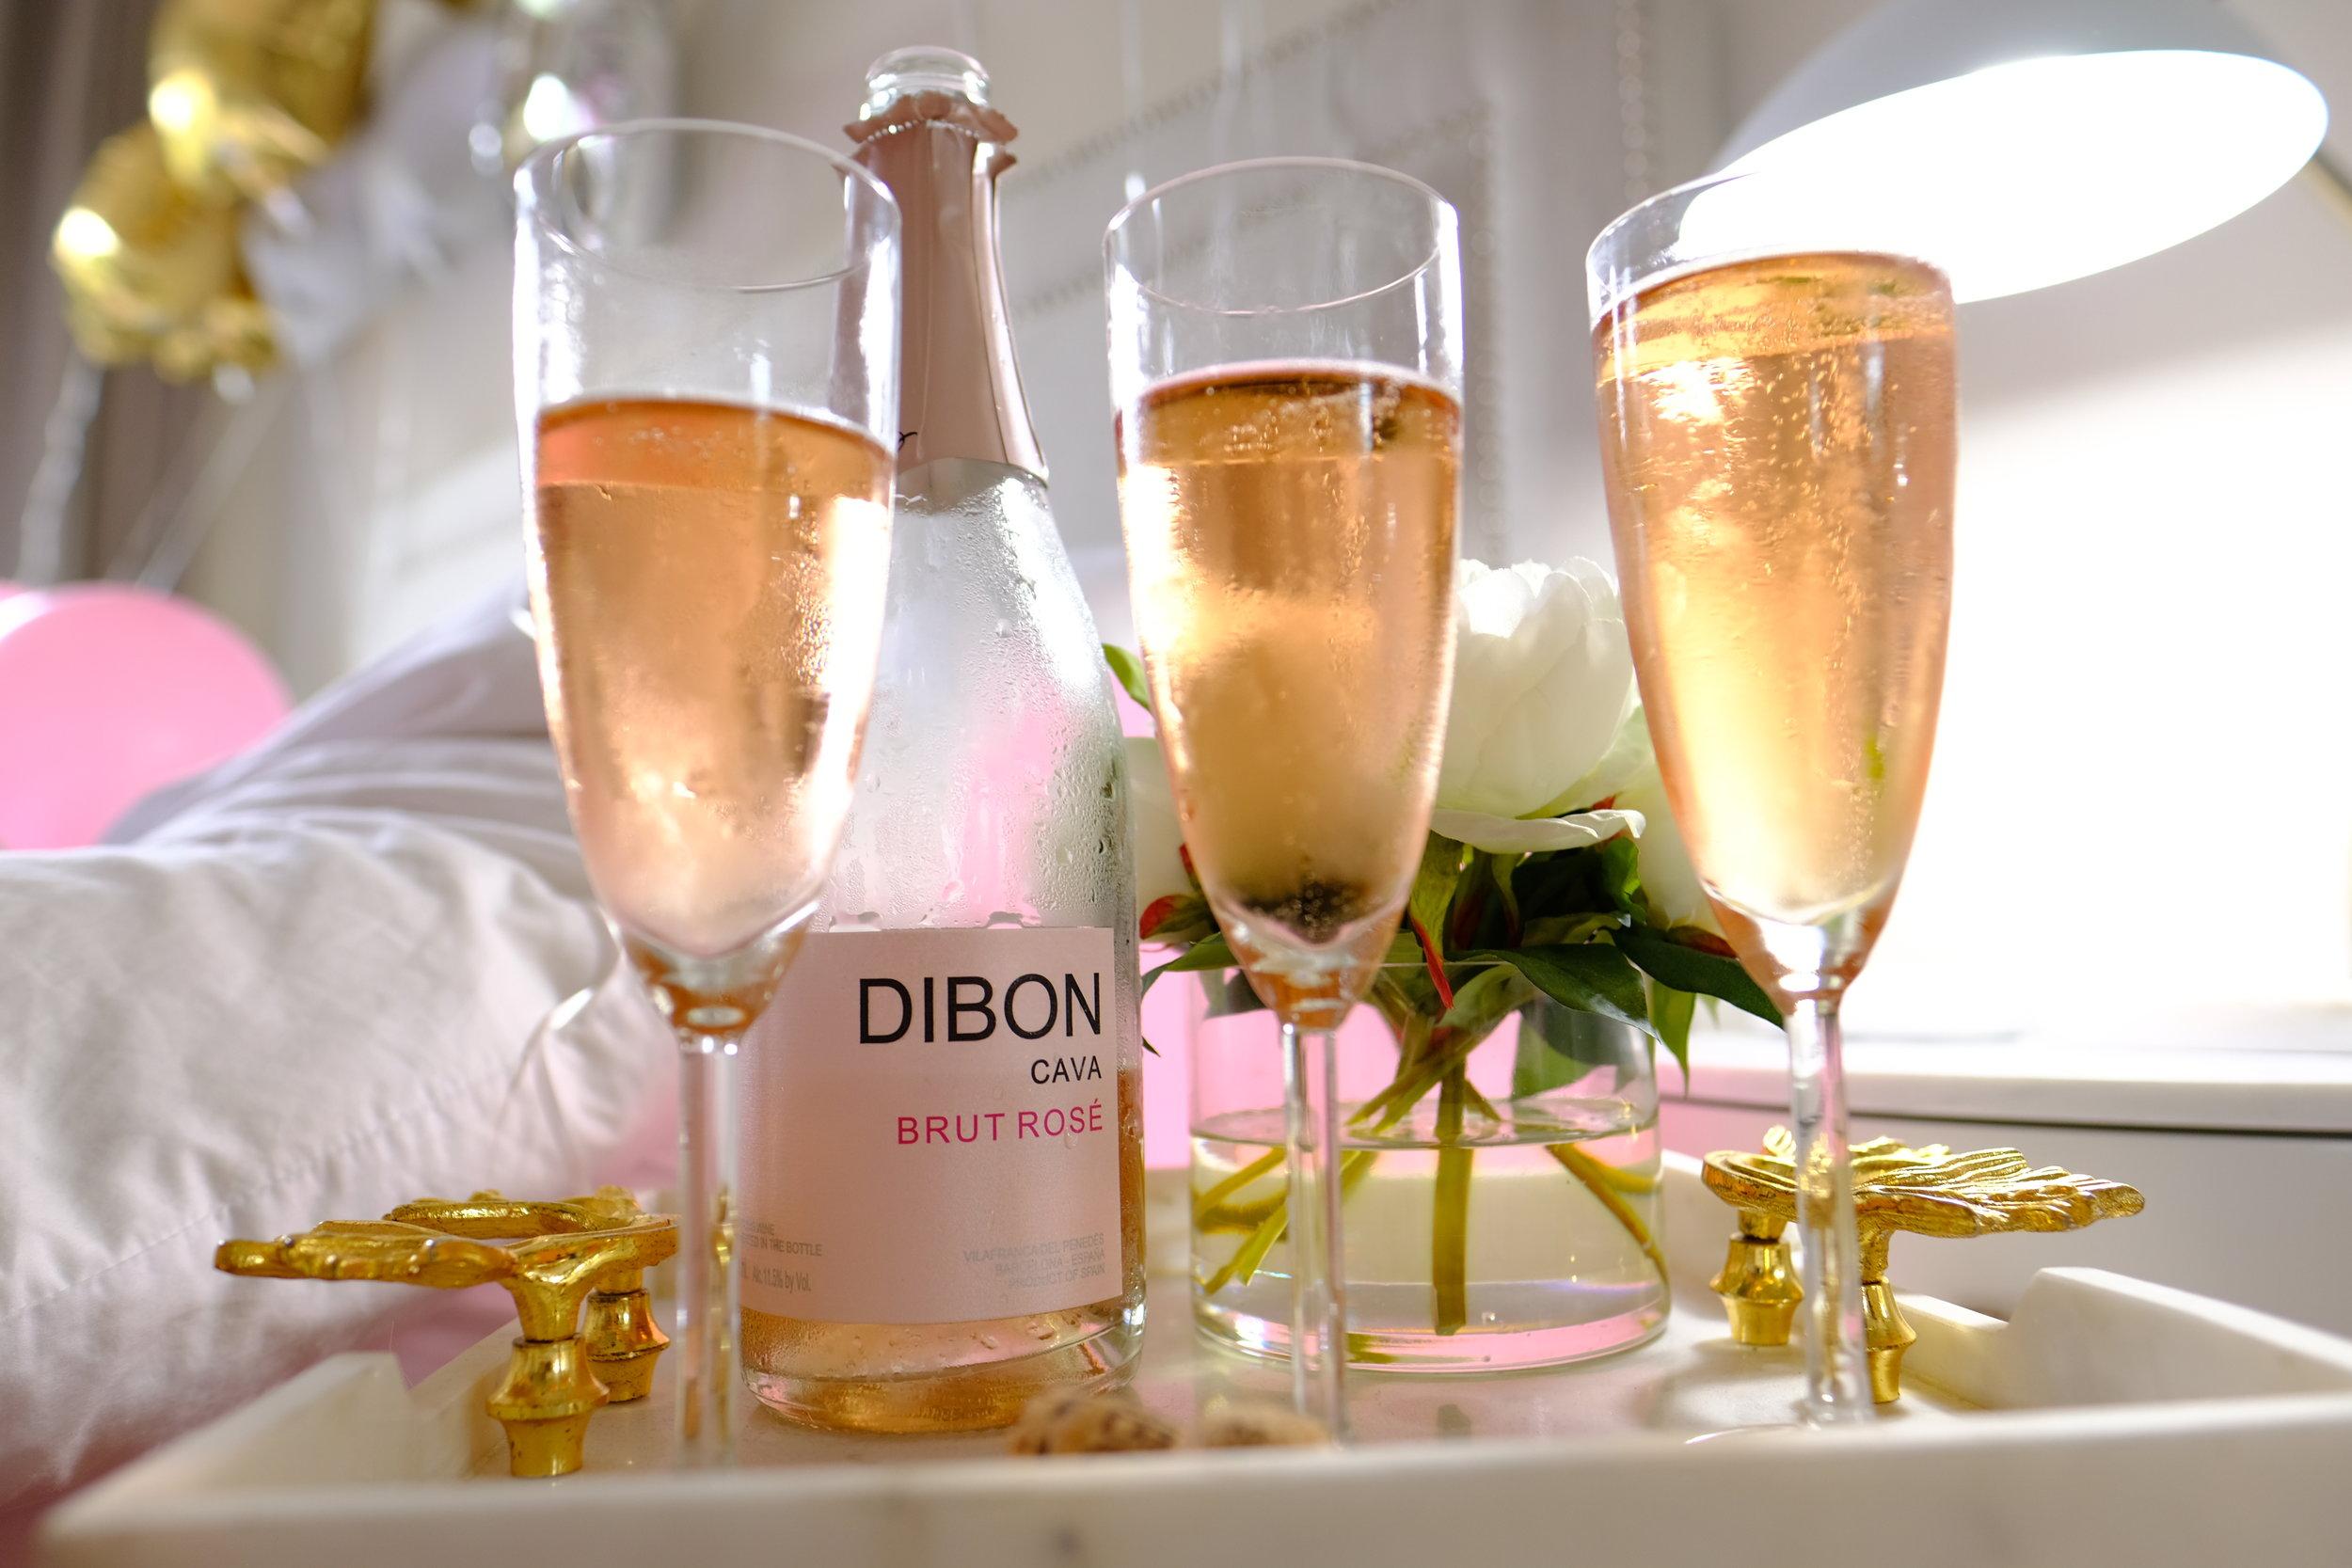 dibon cava brut rose- birthday champs